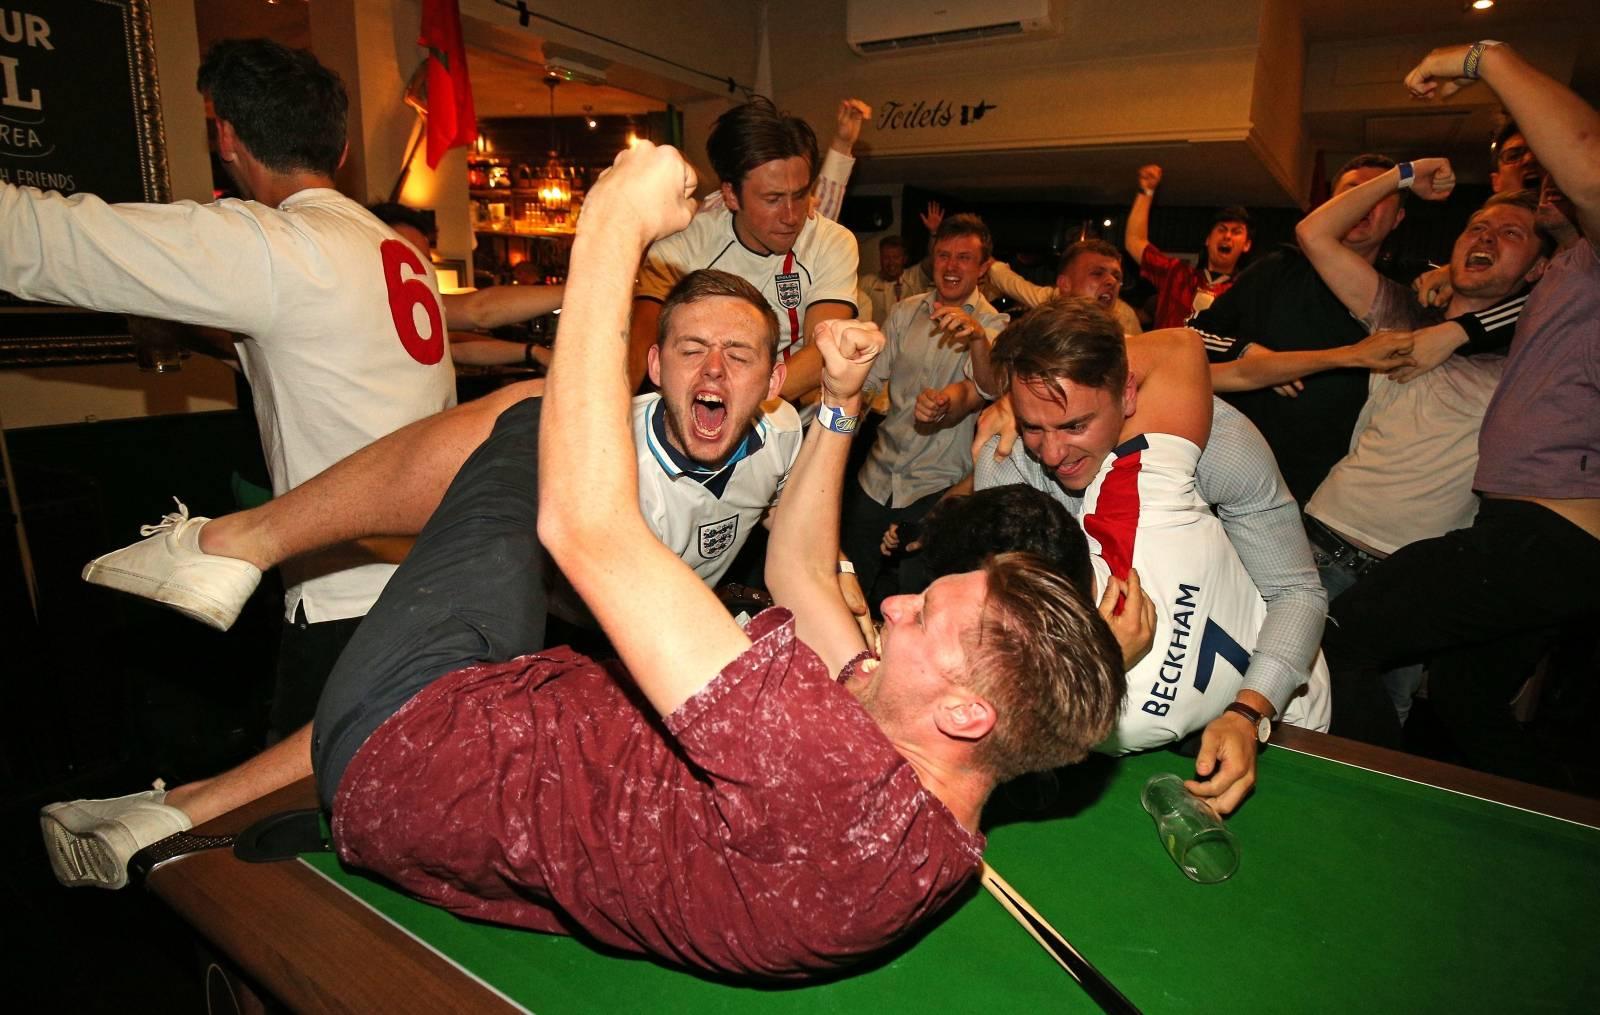 England Fans in UK